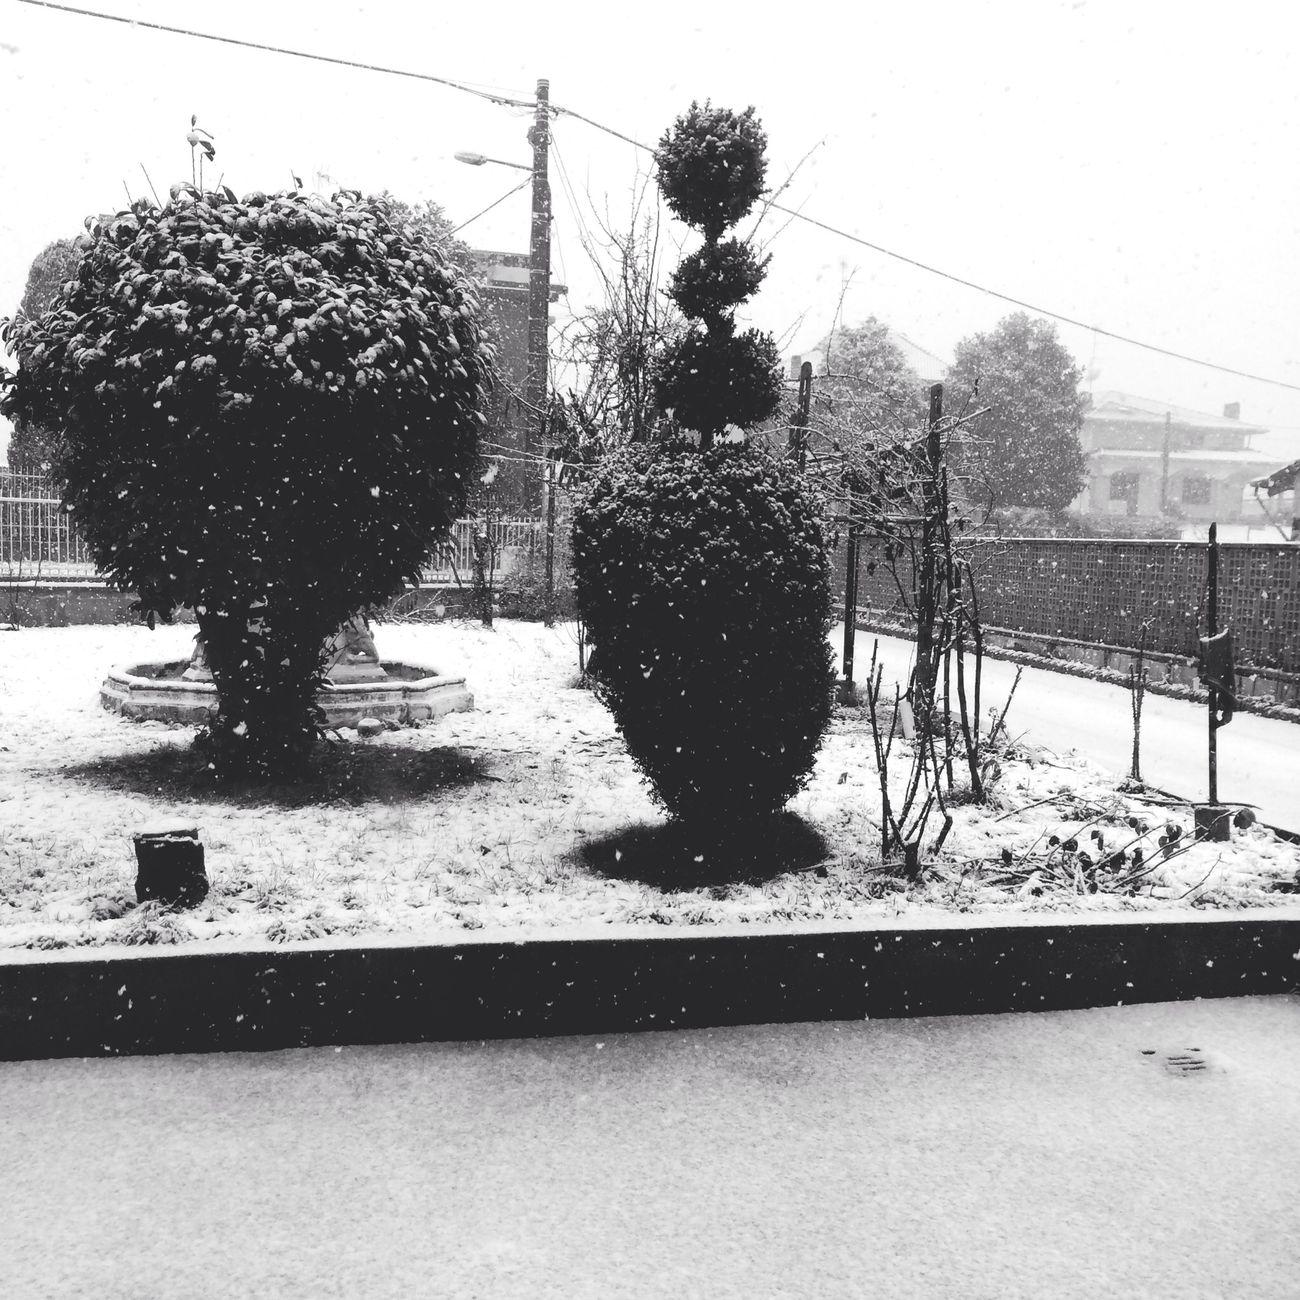 Snow Letitsnowletitsnowletitsnow Landscape Italy ❄️